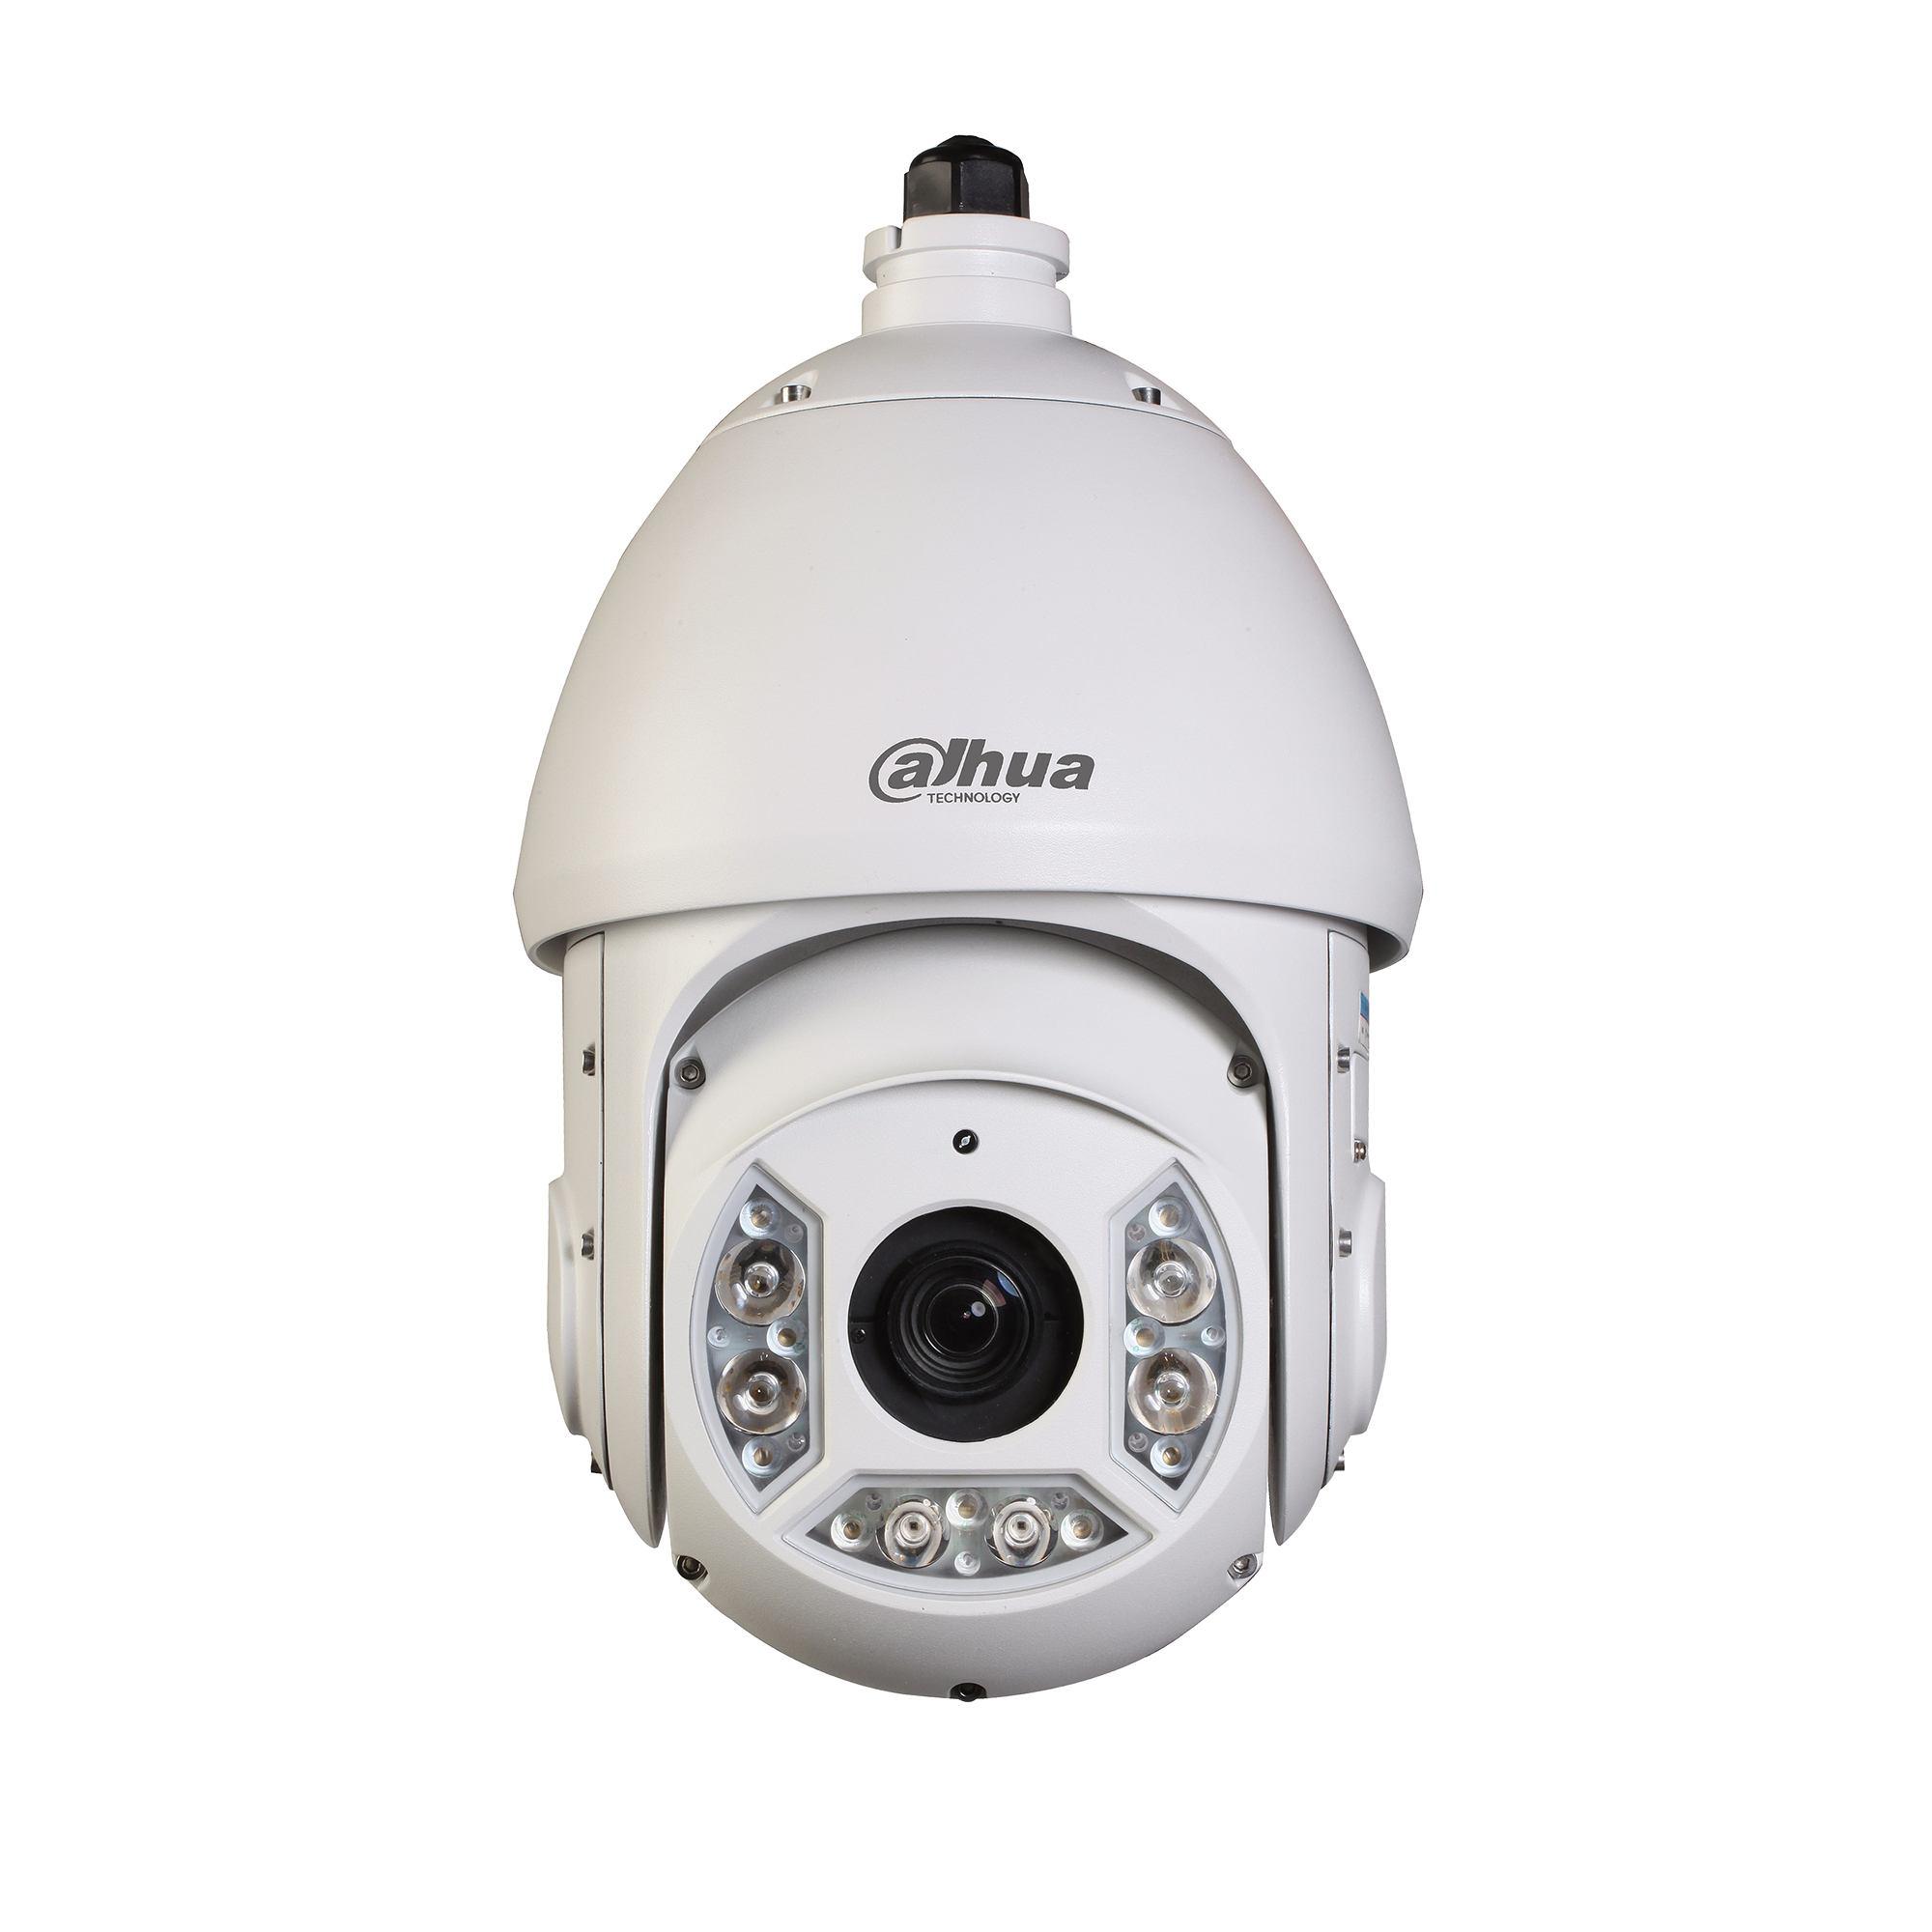 Dahua Europe SD6C225I-HC - Dahua Europe Pro SD6C225IHC IP security